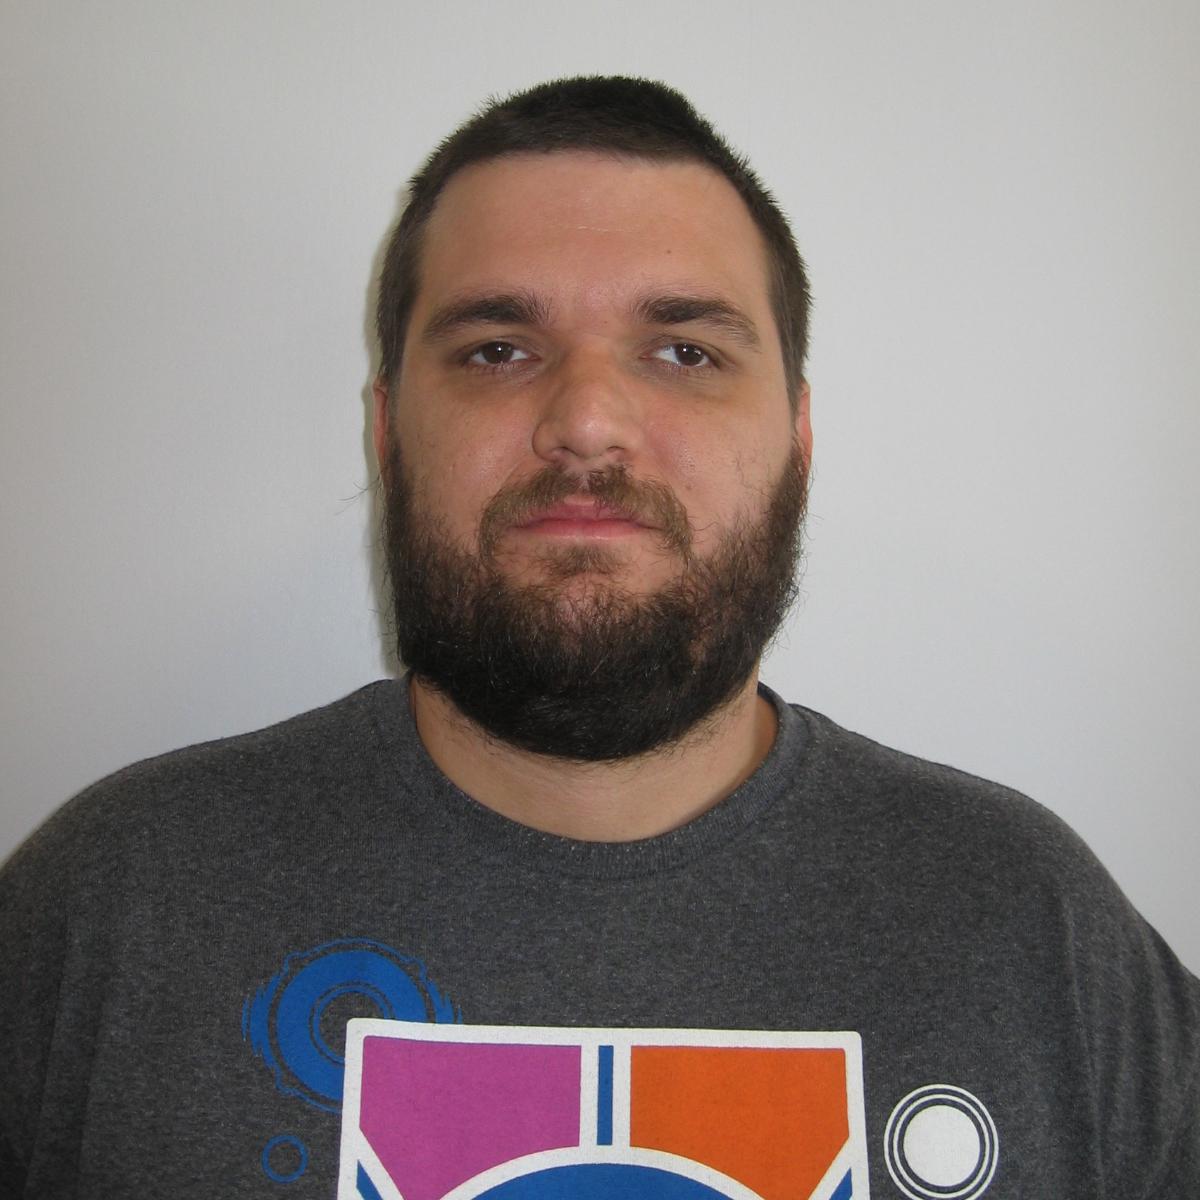 Brandon Voigt, KMS, Custodian